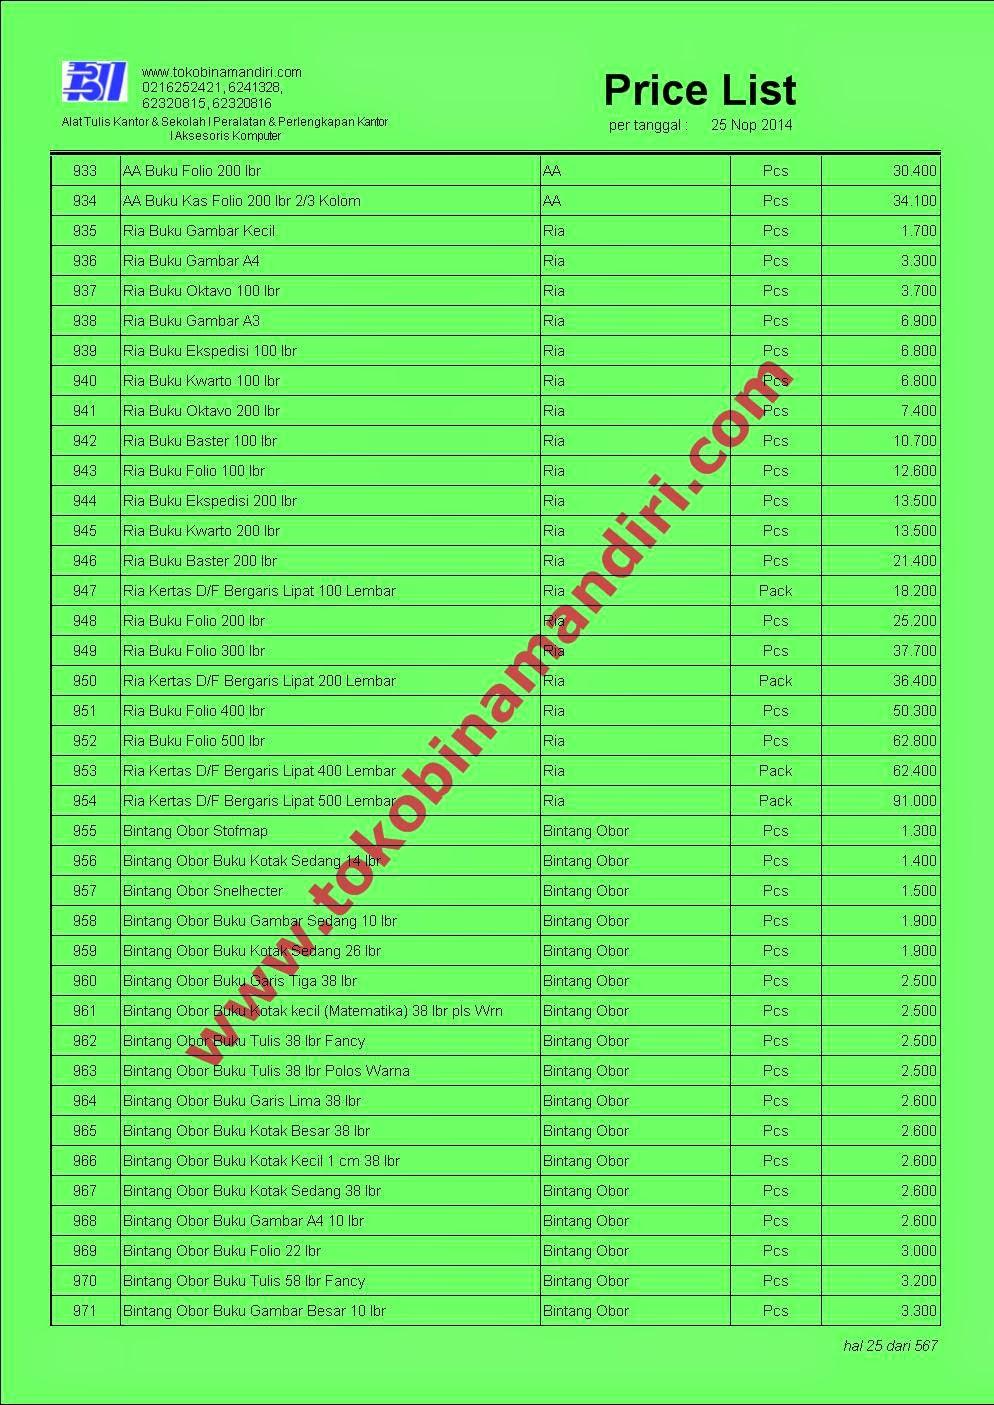 daftar harga alat tulis sekolah 2015  | CV. Bina Mandiri - toko alat tulis kantor agen perlengkapan sekolah